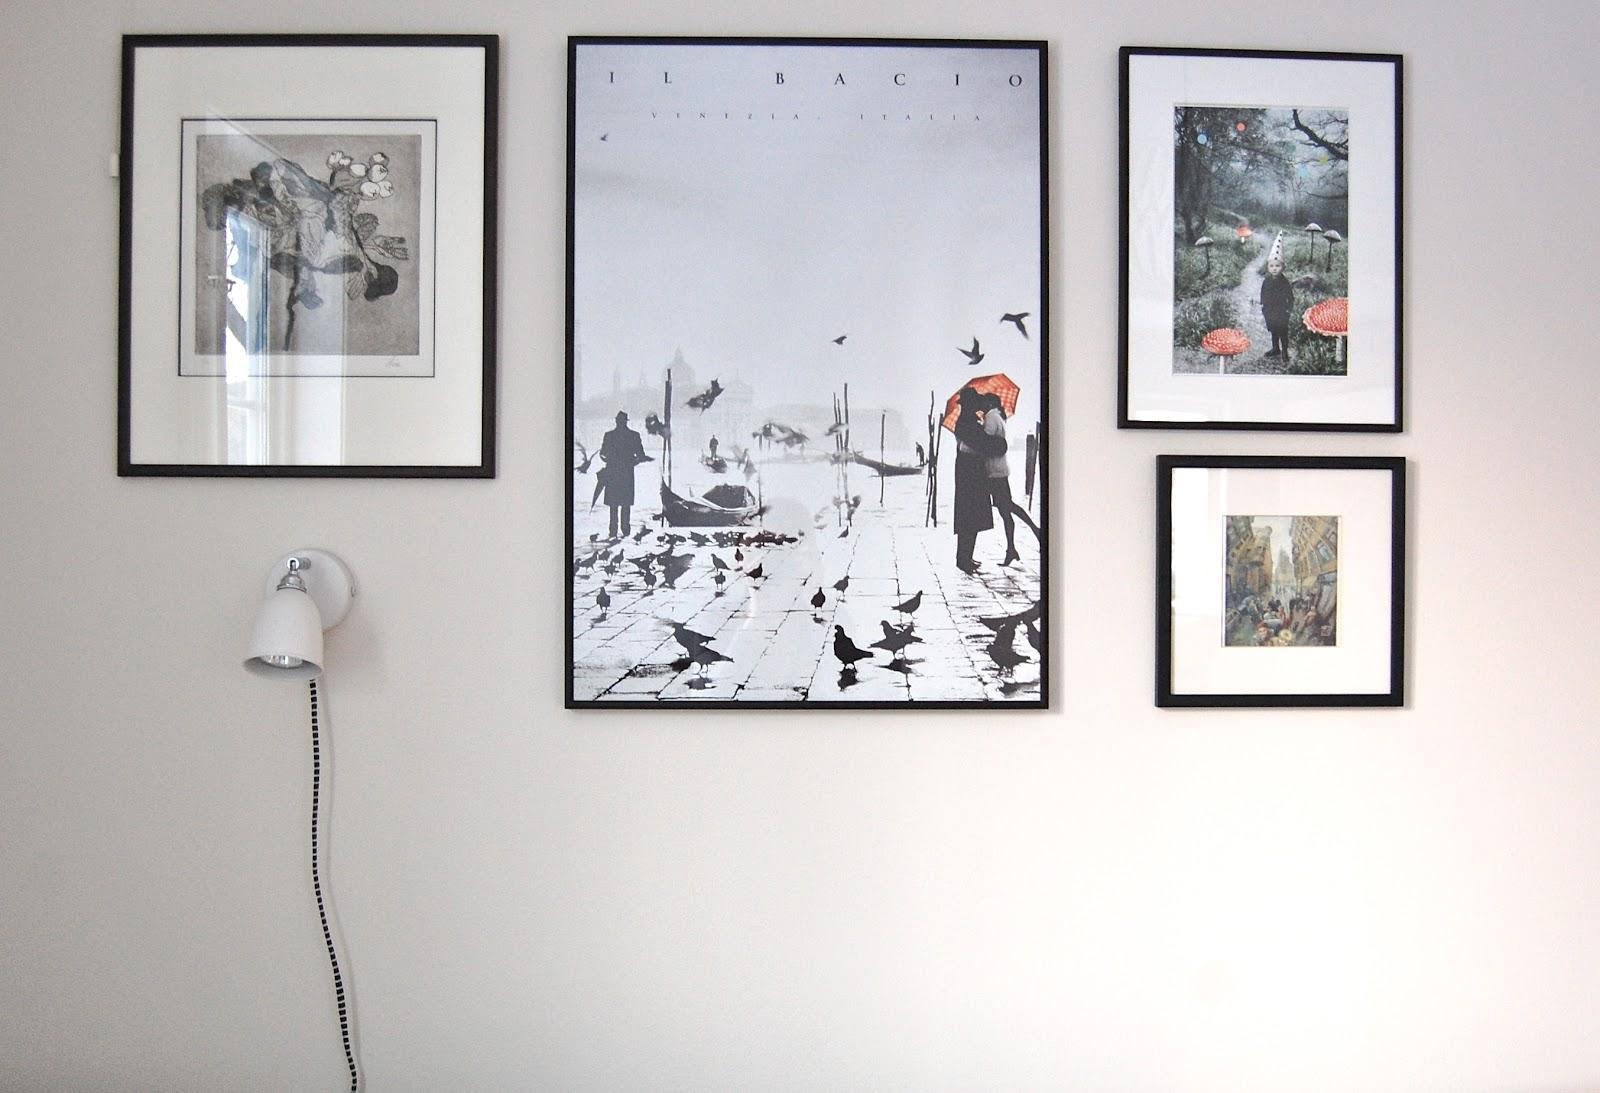 bilder på veggen interiør